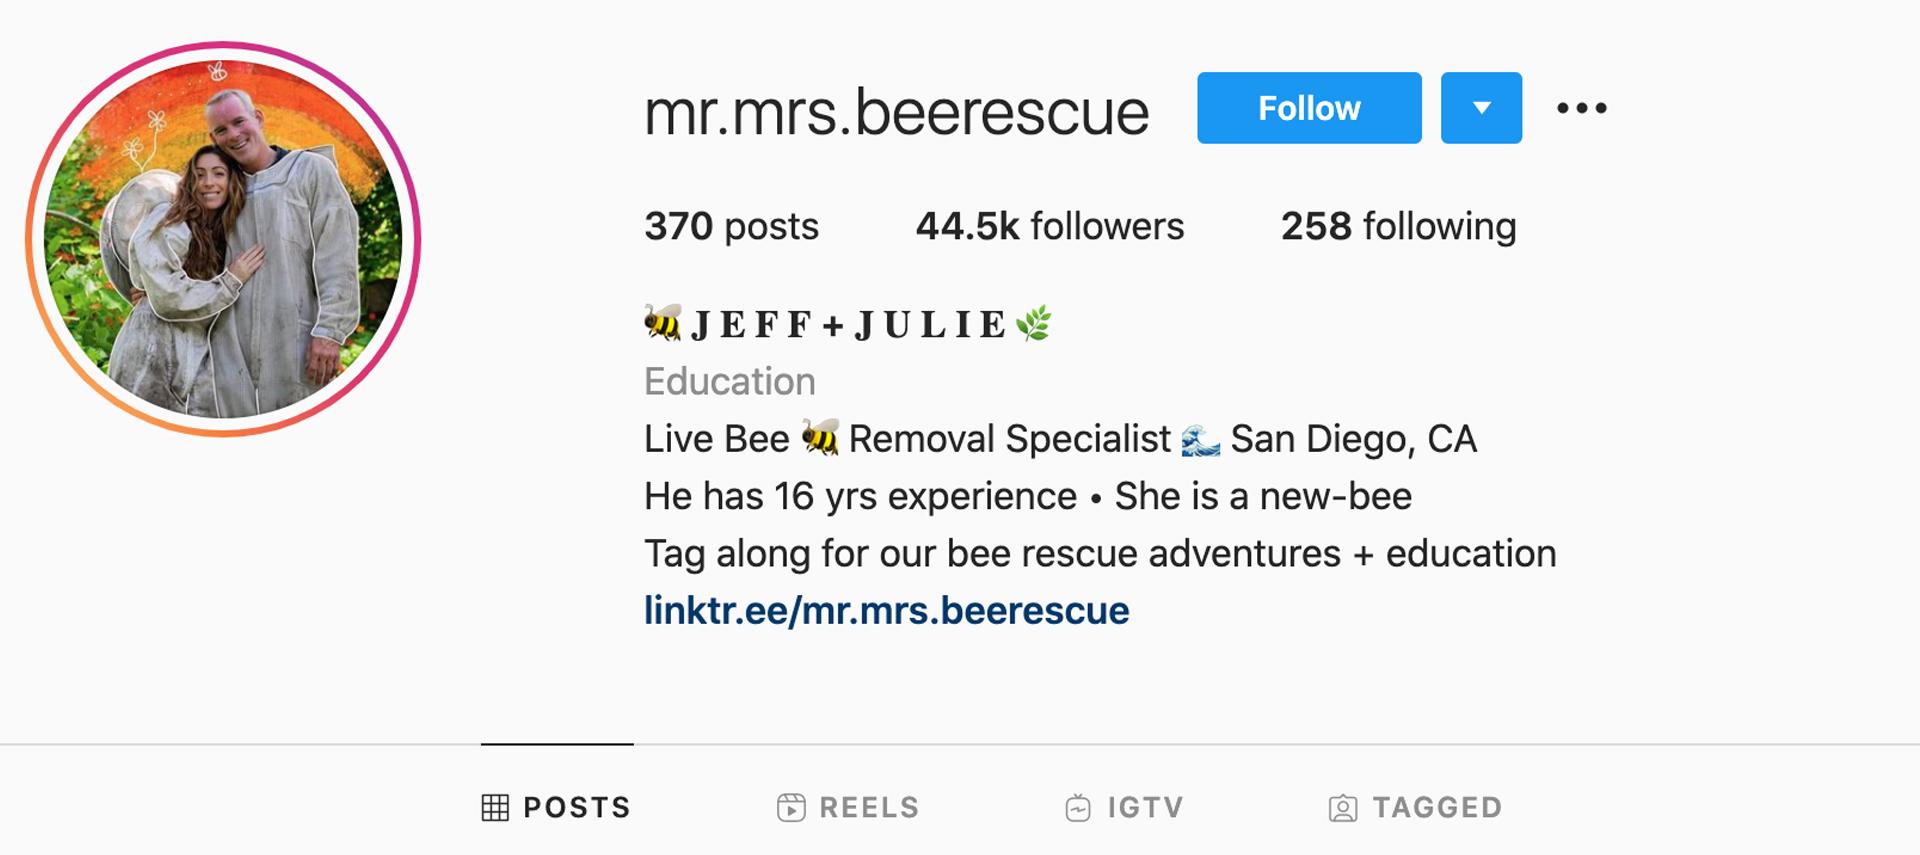 mr-mrs-bee-rescue-instagram-profile